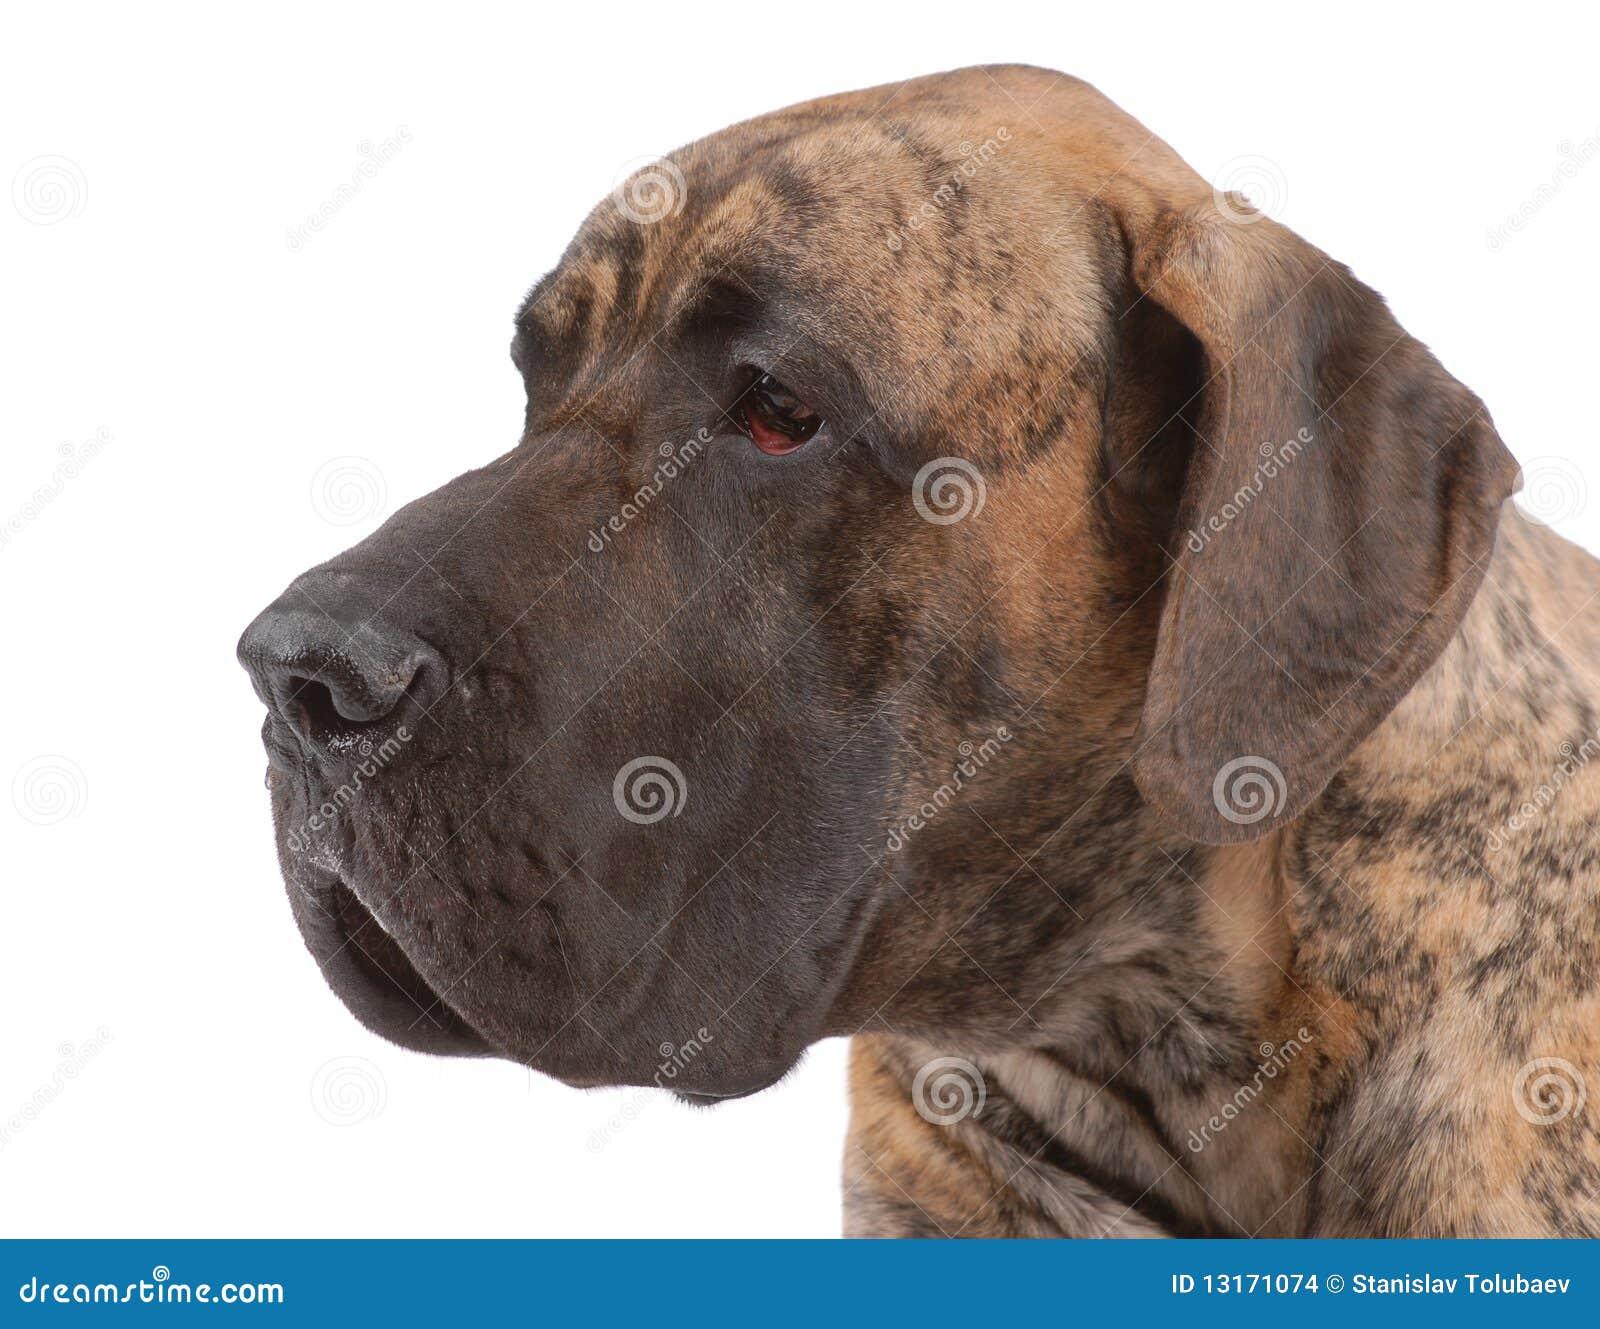 German Mastiff Stock Images - Image: 13171074  German Mastiff Breeds